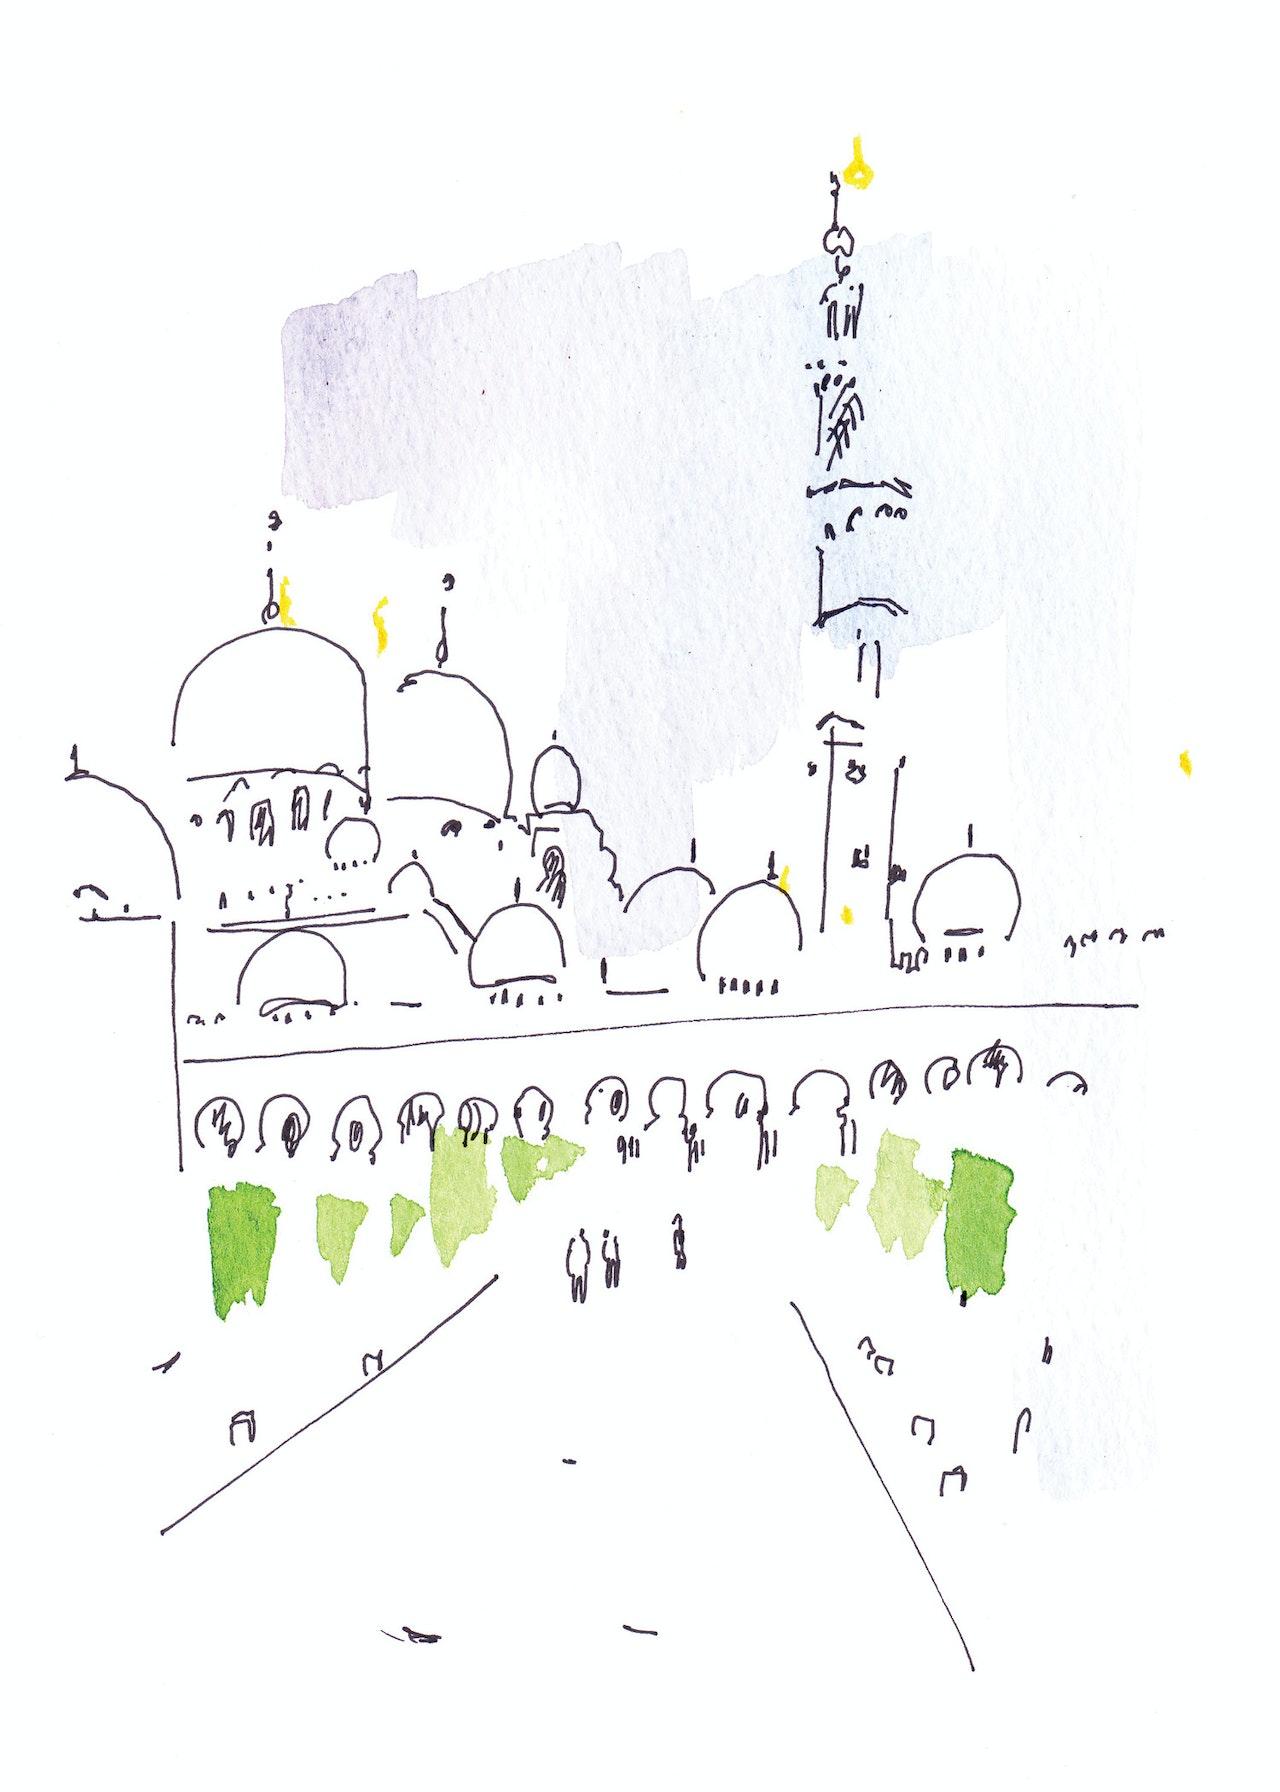 Abu Dhabi Christmas card commission